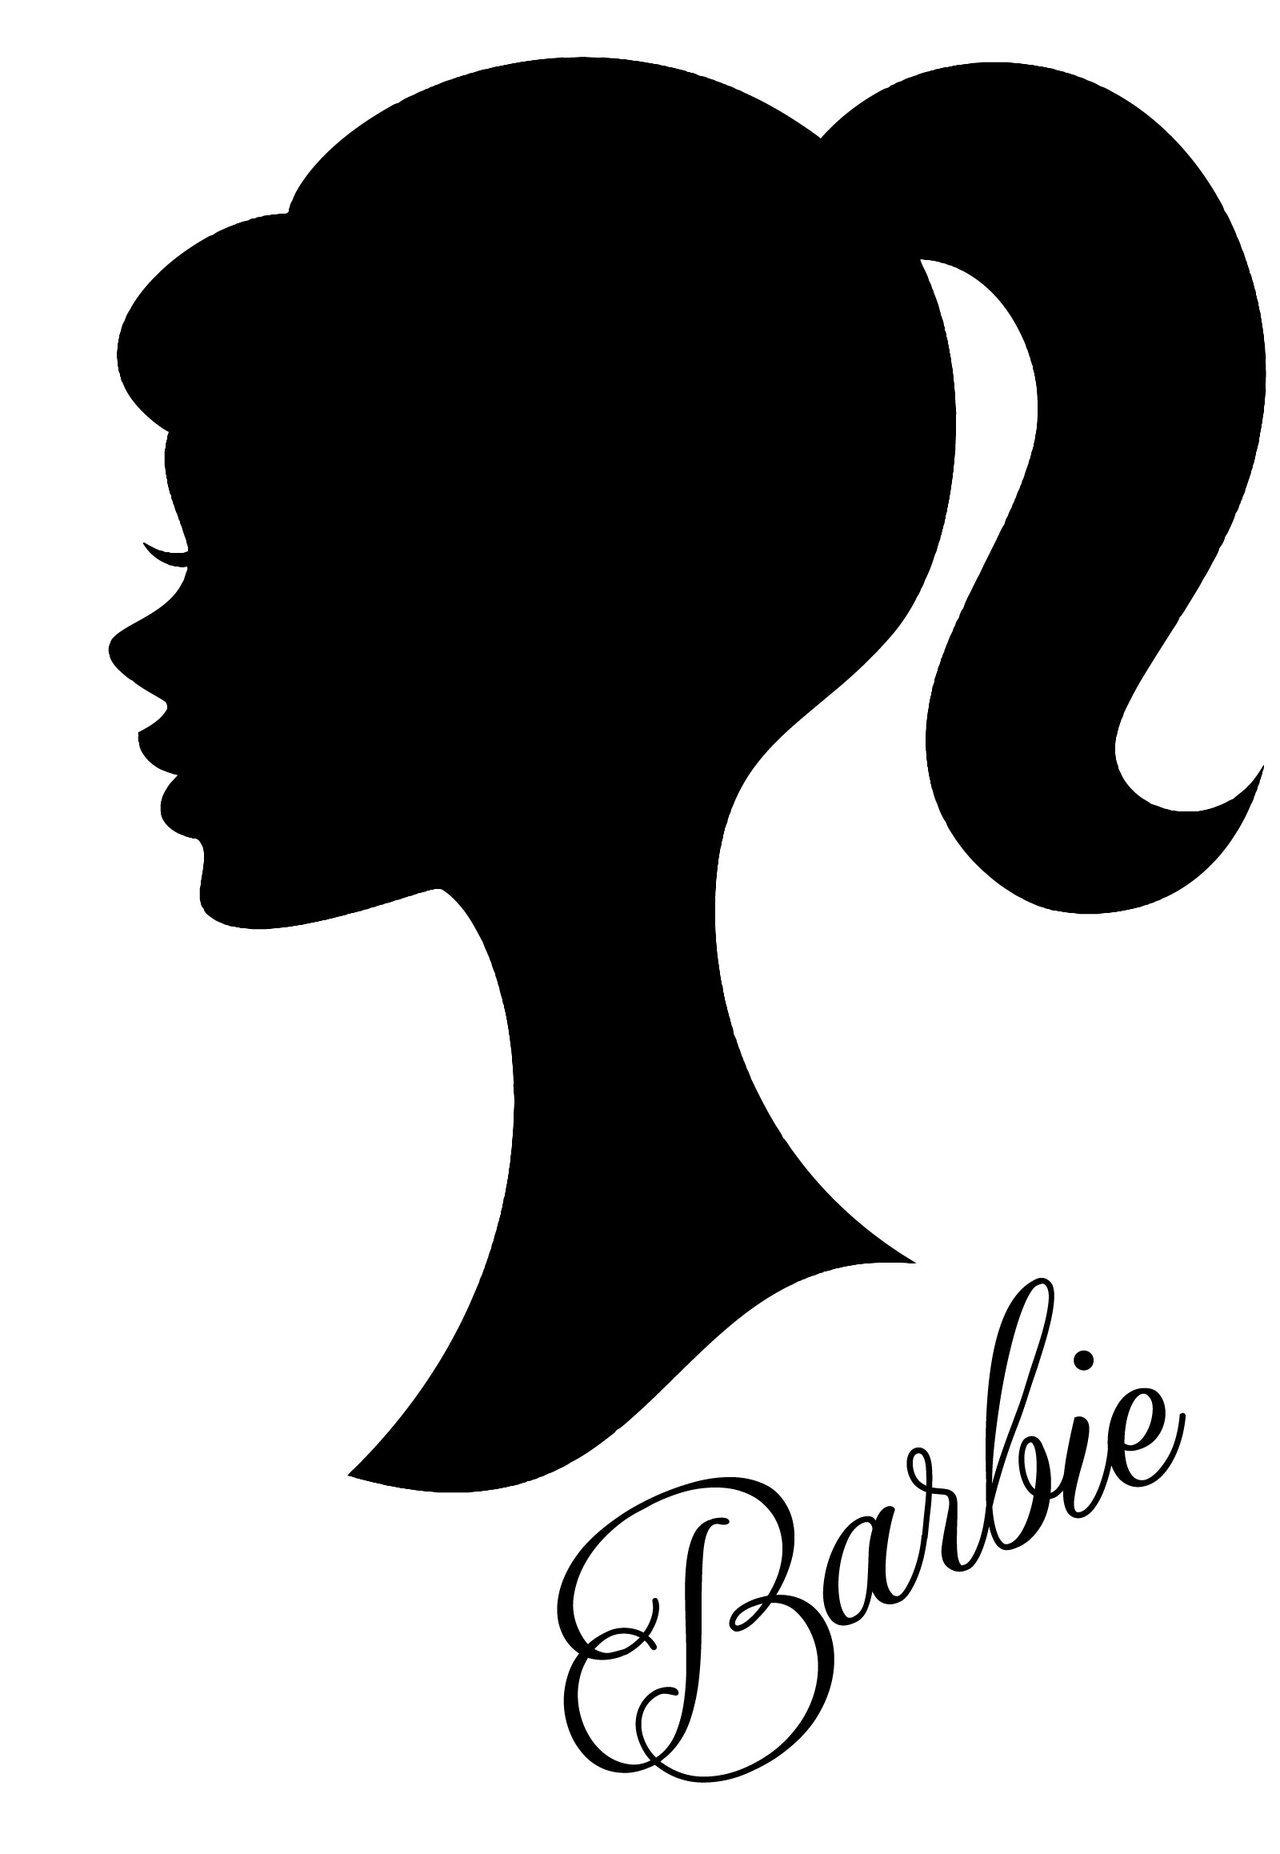 Frankies Cajun Customs Barbie V2 Vinyl Decal, Wall, Car, Laptop - Lavender - 30 inch